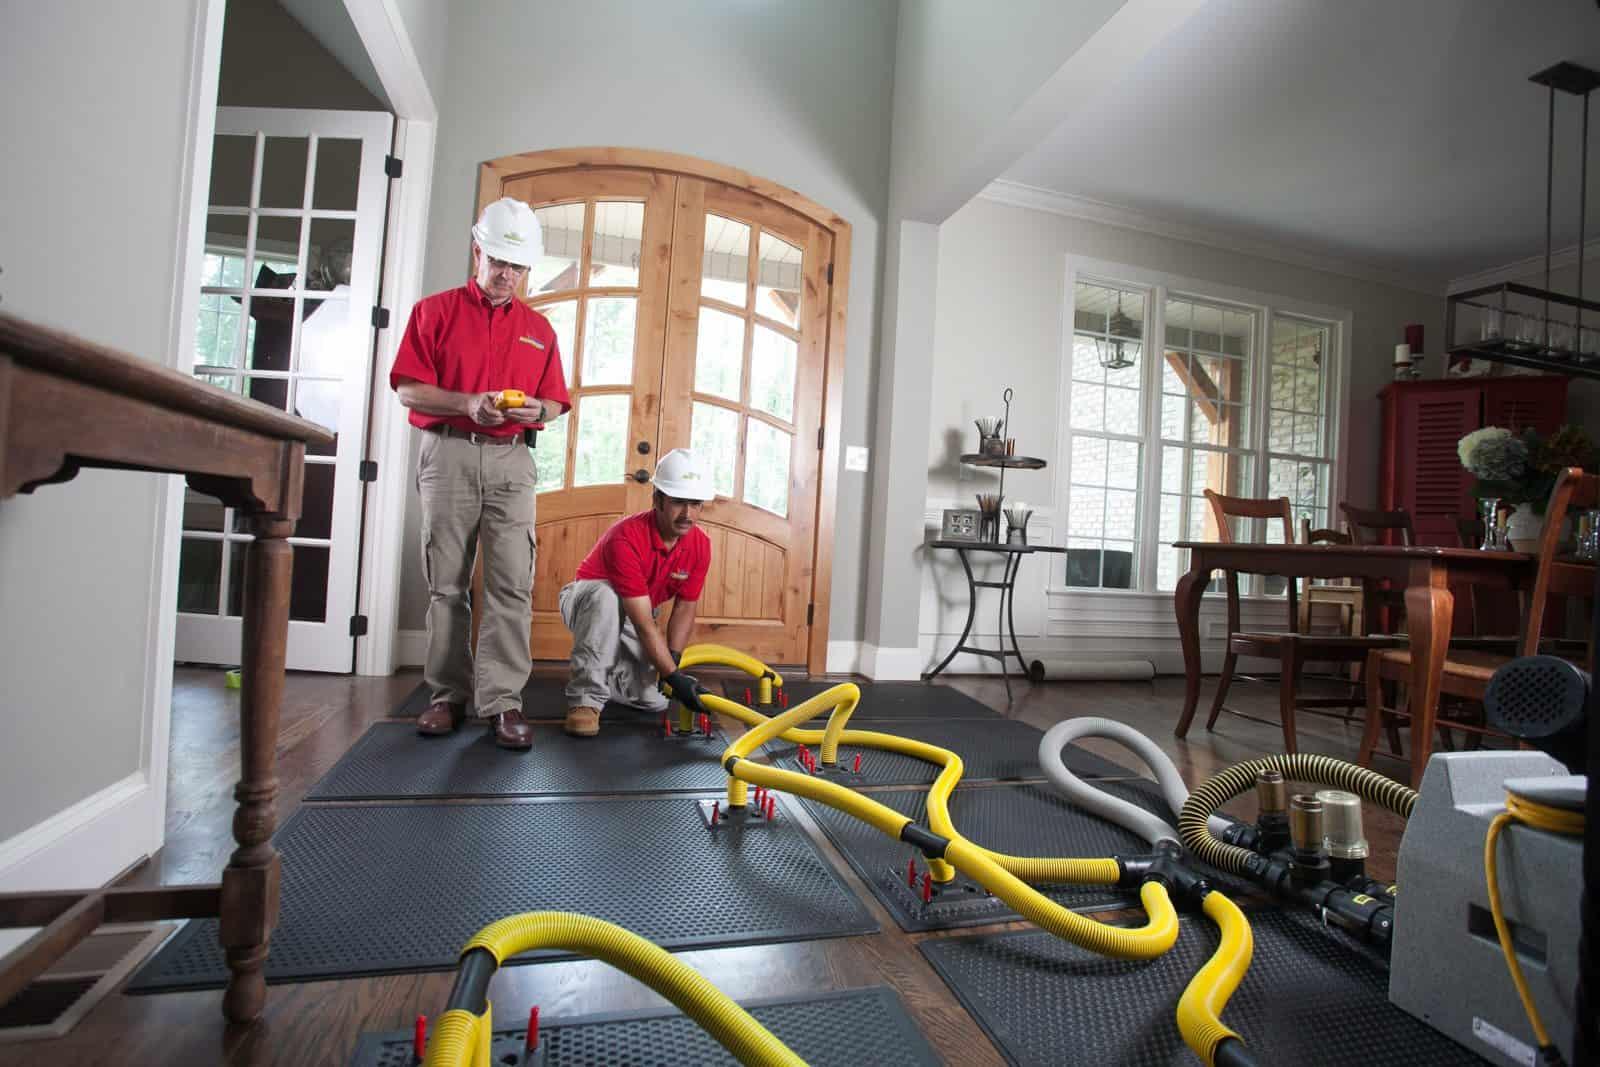 Disaster restoration companies in Greensboro